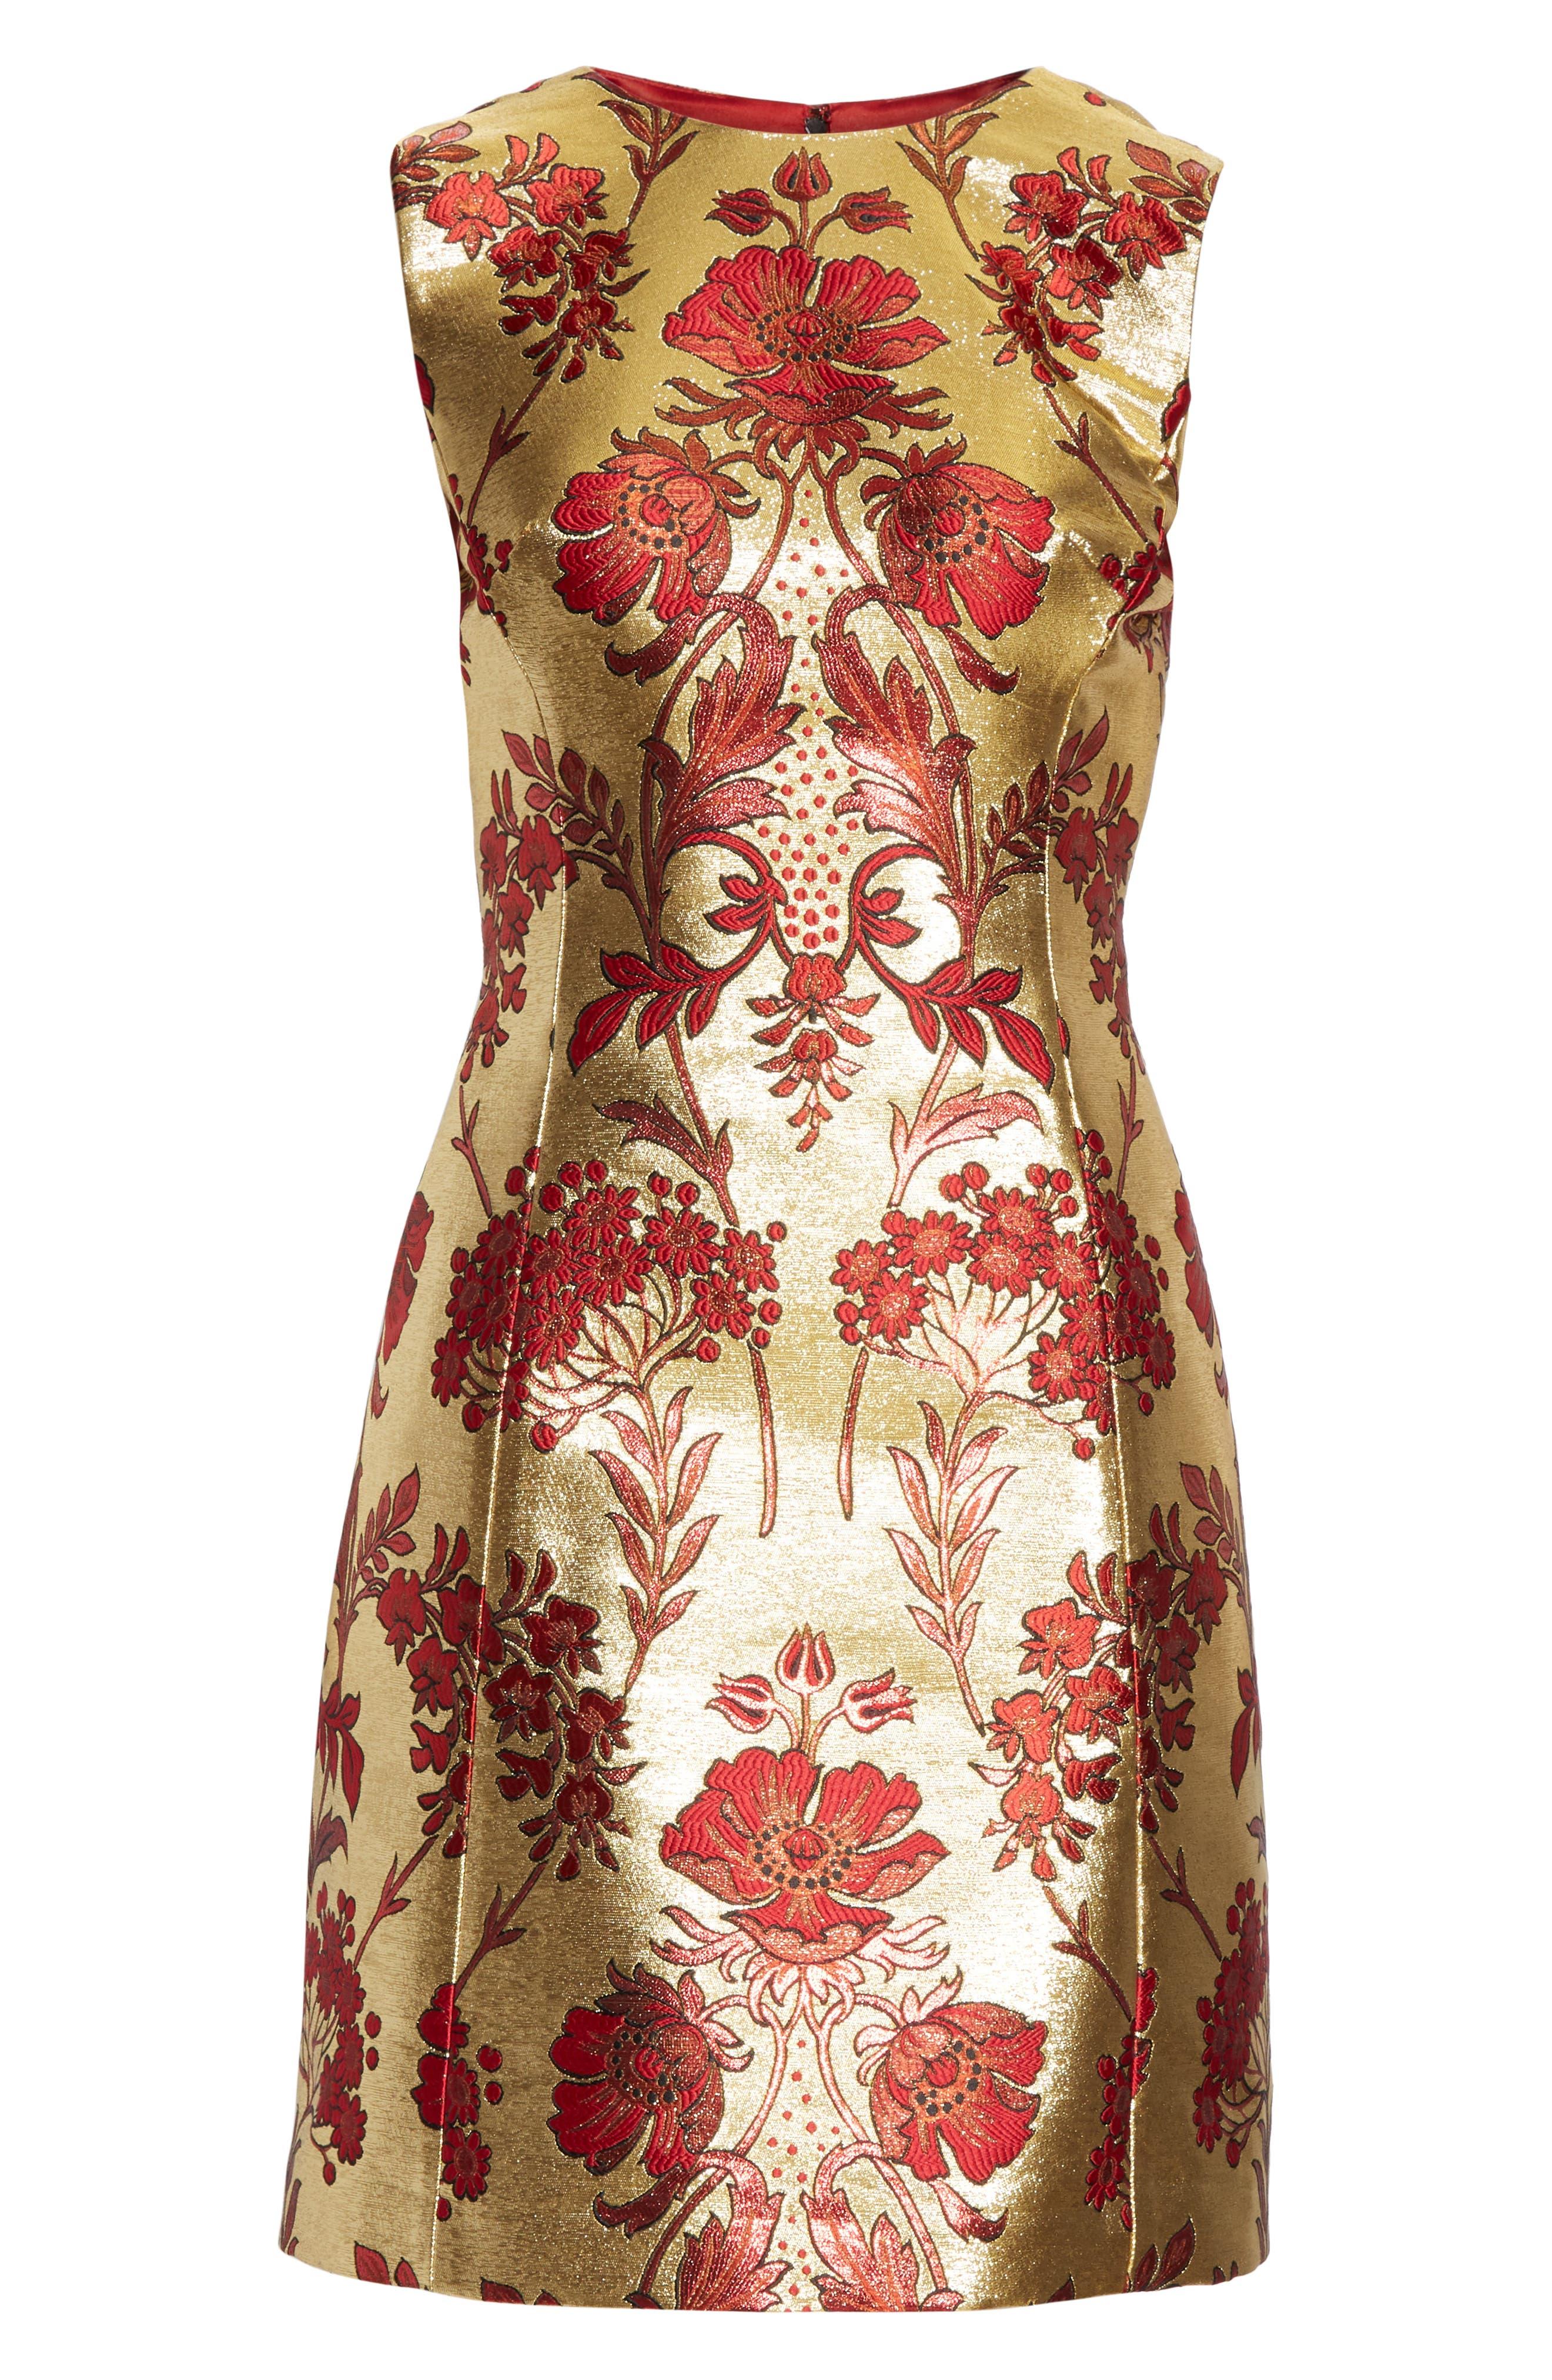 Metallic Jacquard A-Line Dress,                             Alternate thumbnail 6, color,                             S8351 JACQUARD LUREX FLORAL